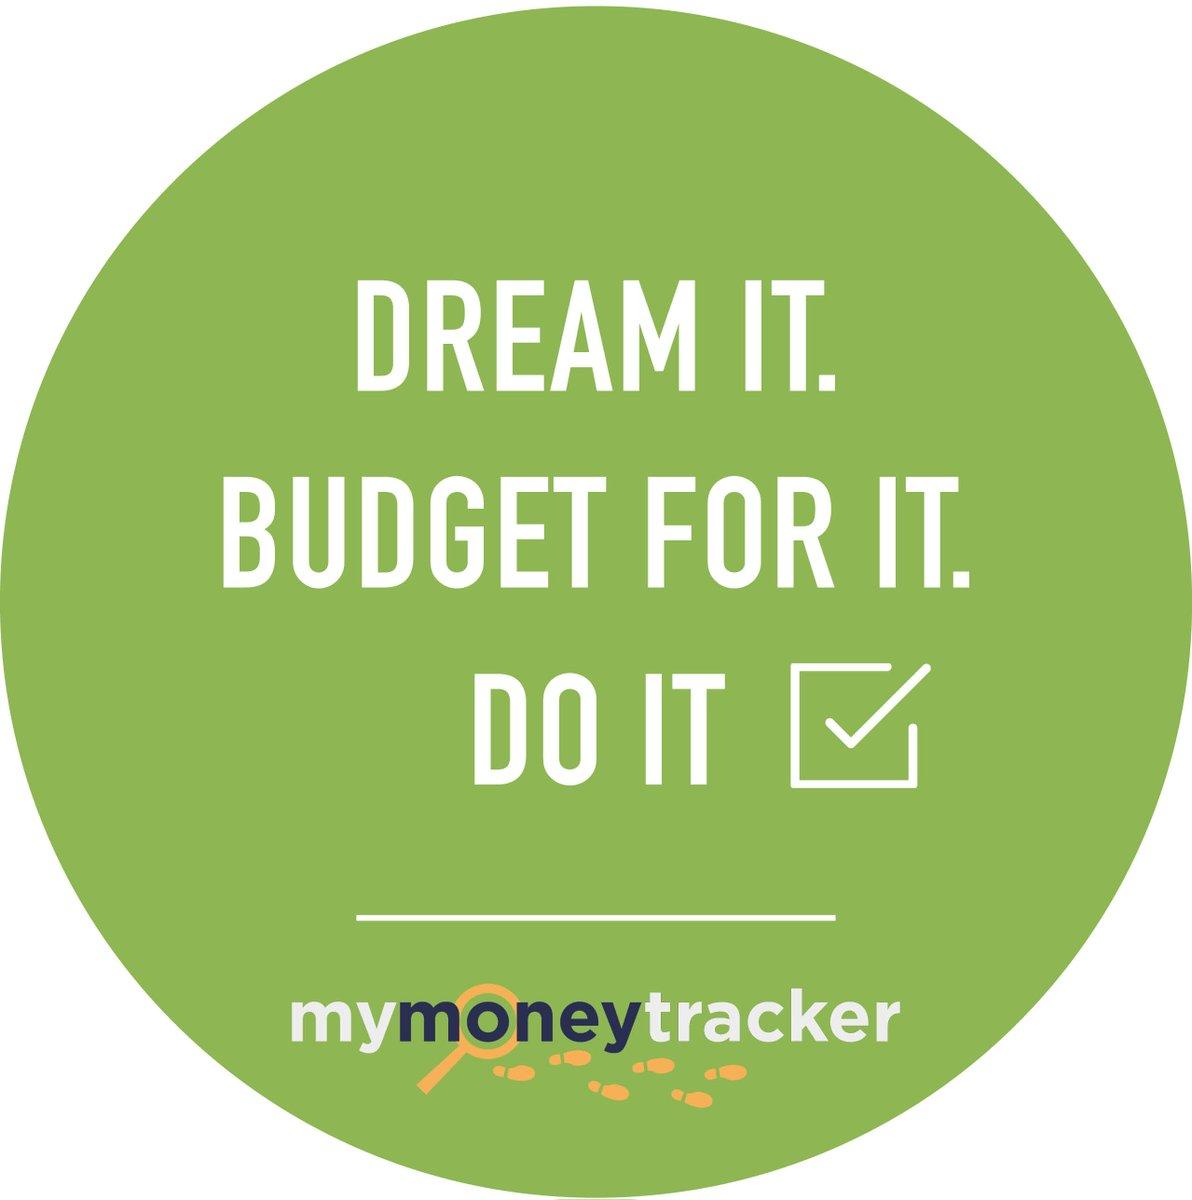 #BUDGET #MONEY #SAVE #MONEYGOALS pic.twitter.com/NzclkLINj3